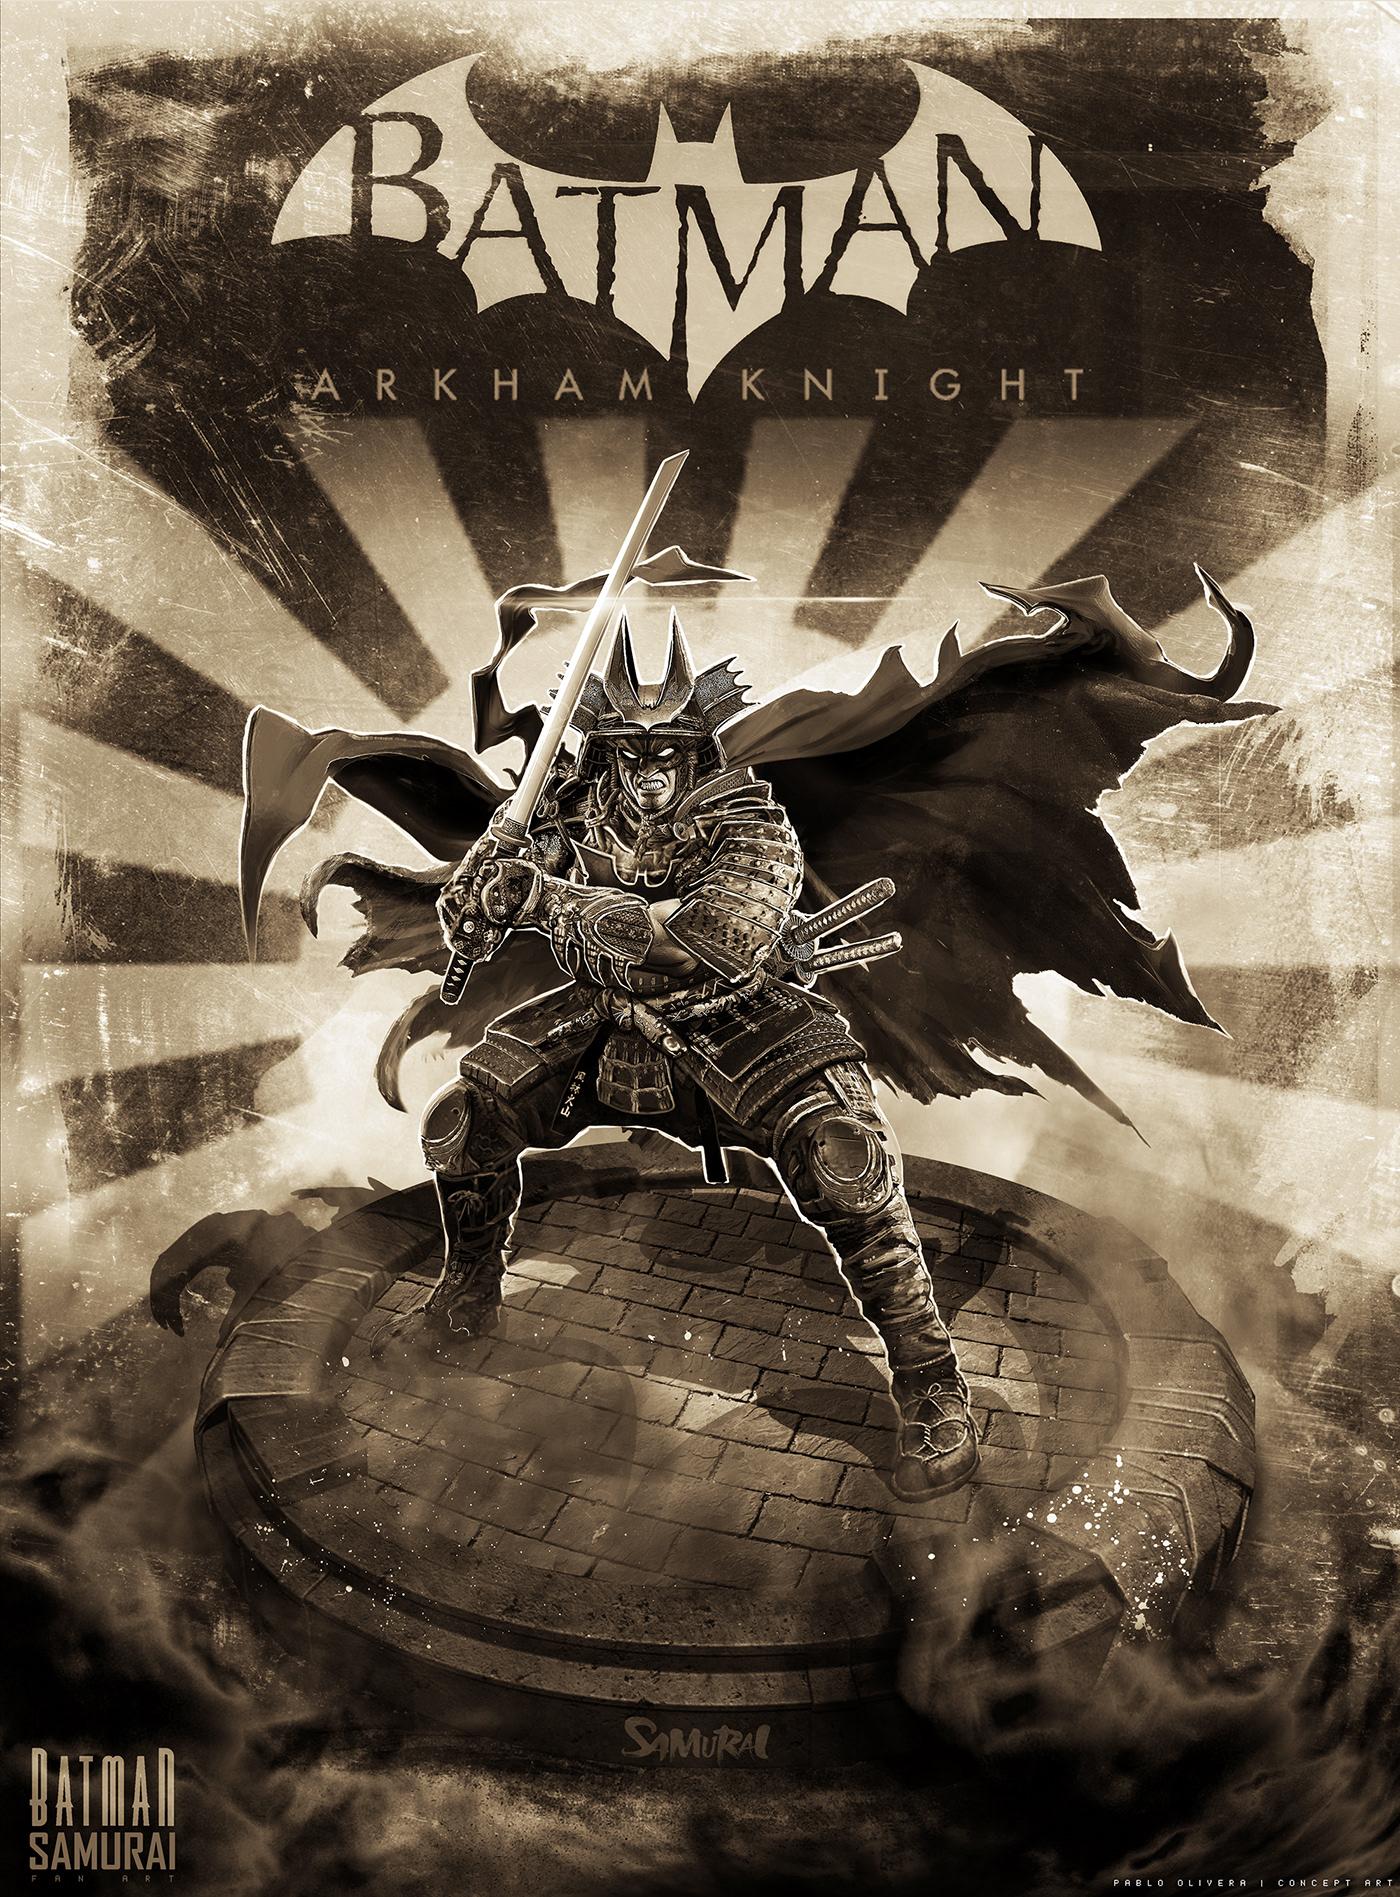 66bc620e4 Batman Samurai, Fan Art work in progress, I hope you like it !!! ( Samurai  Helmet and Ninja Hat version ) and t-shirt version.